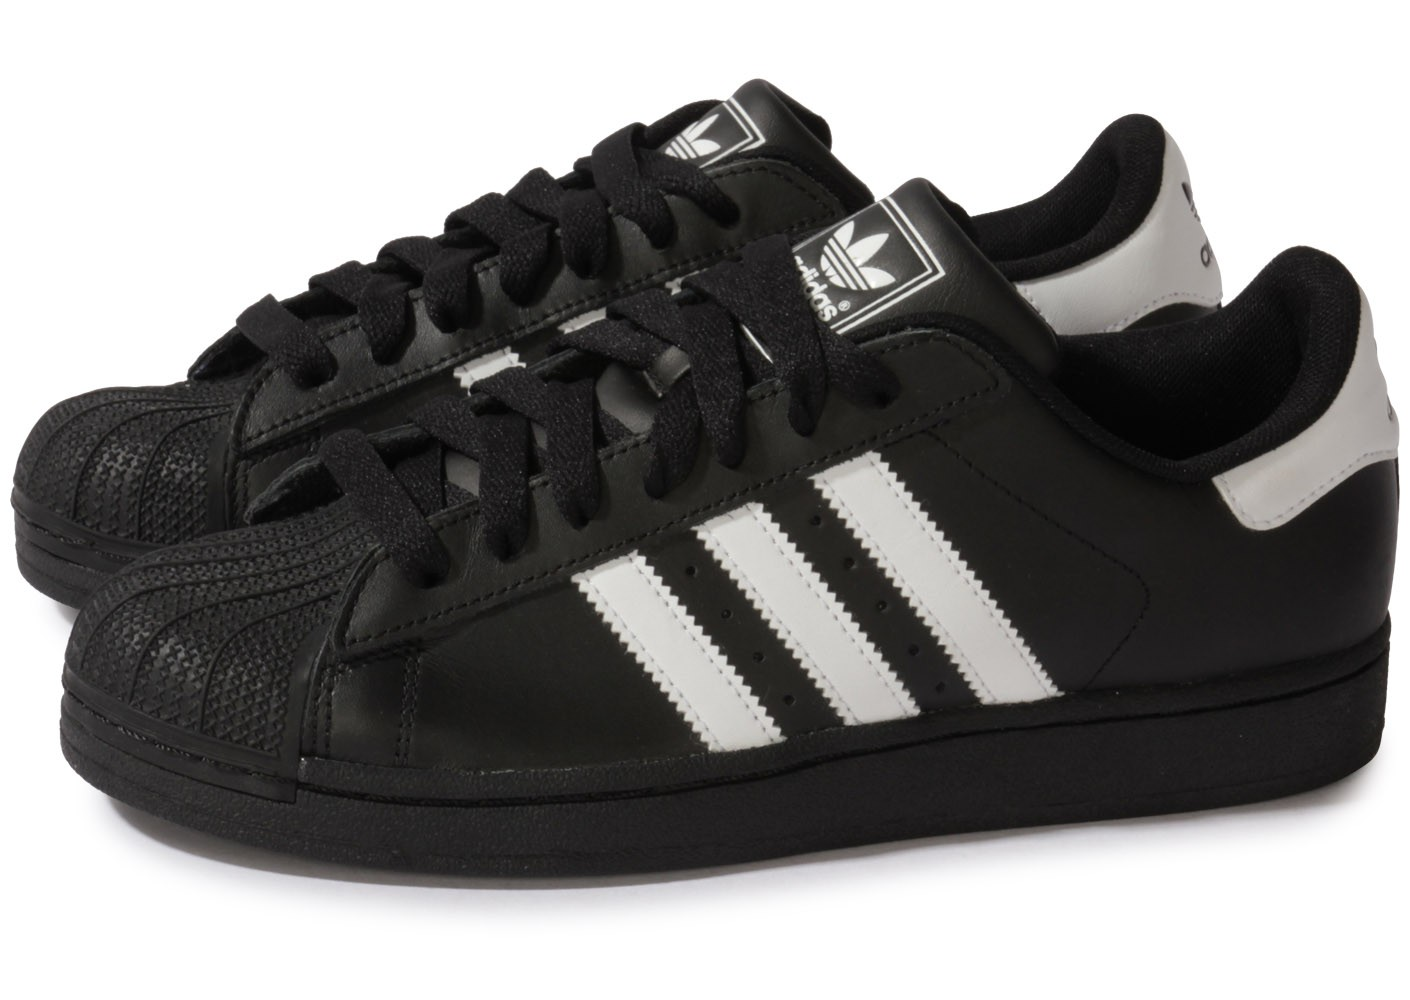 acheter en ligne 0b4cc bcf66 adidas superstar noir et rouge